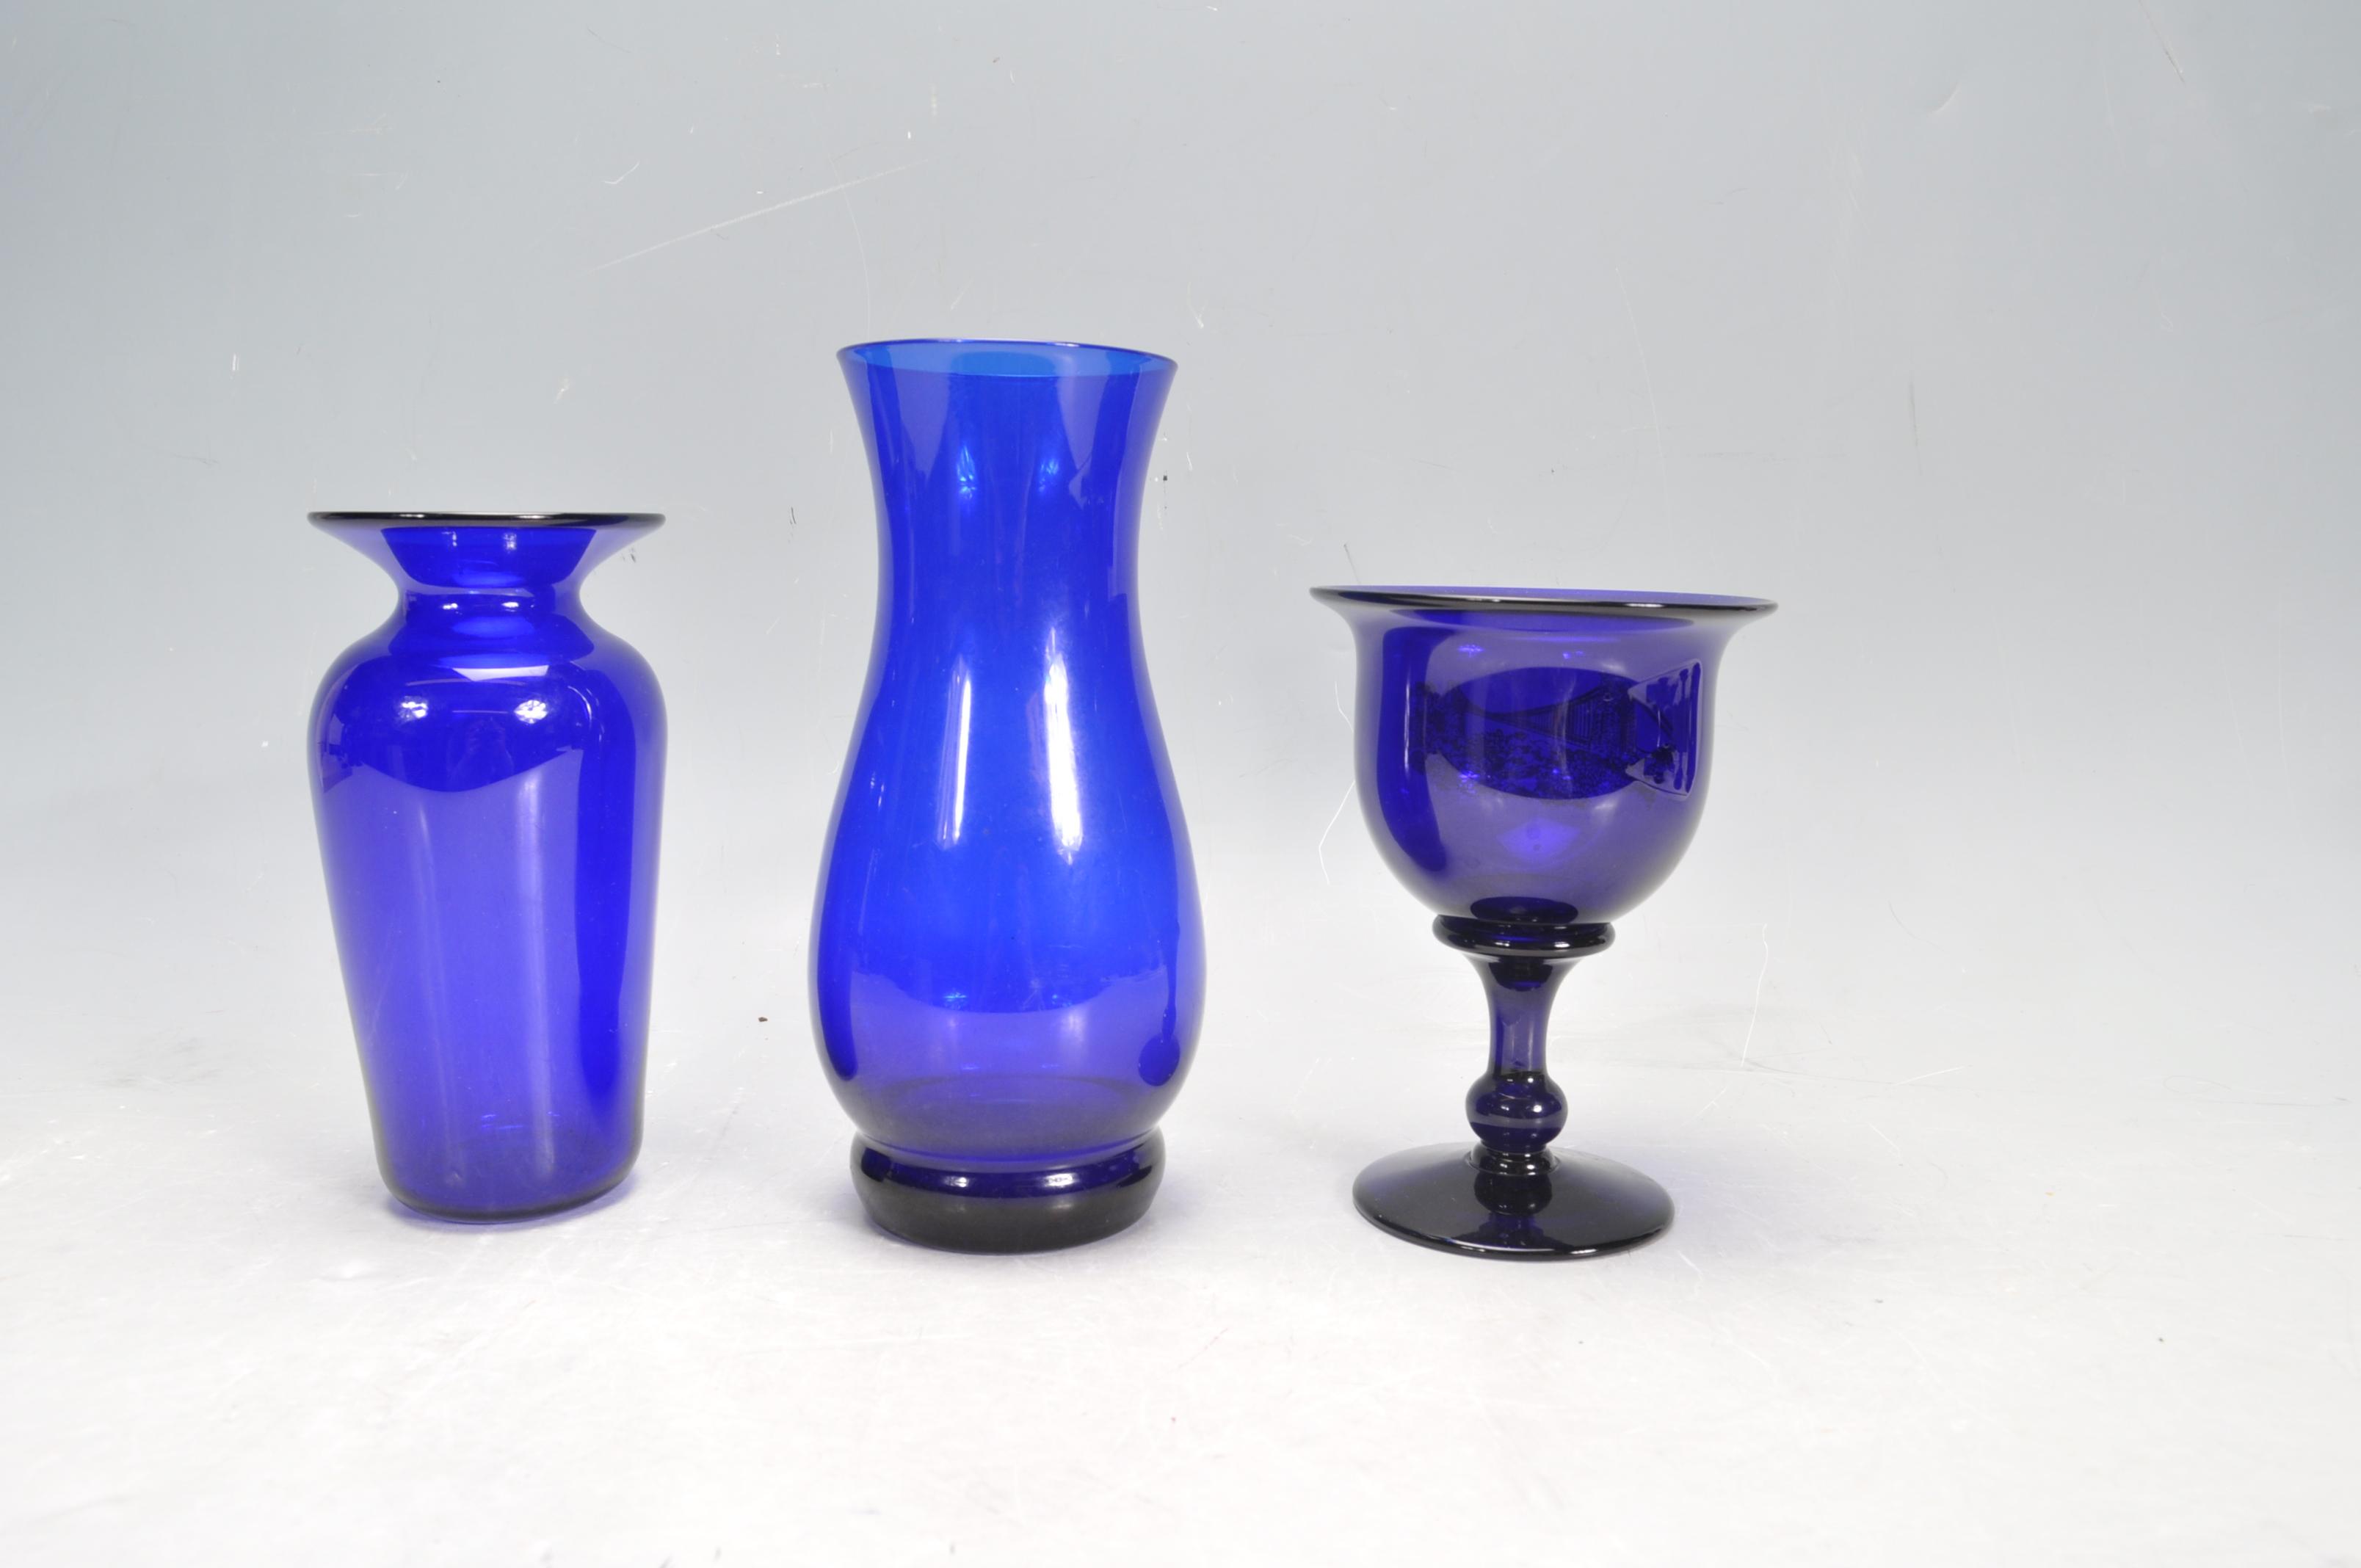 BRISTOL BLUE GLASS ORNAMENTS - Image 10 of 34